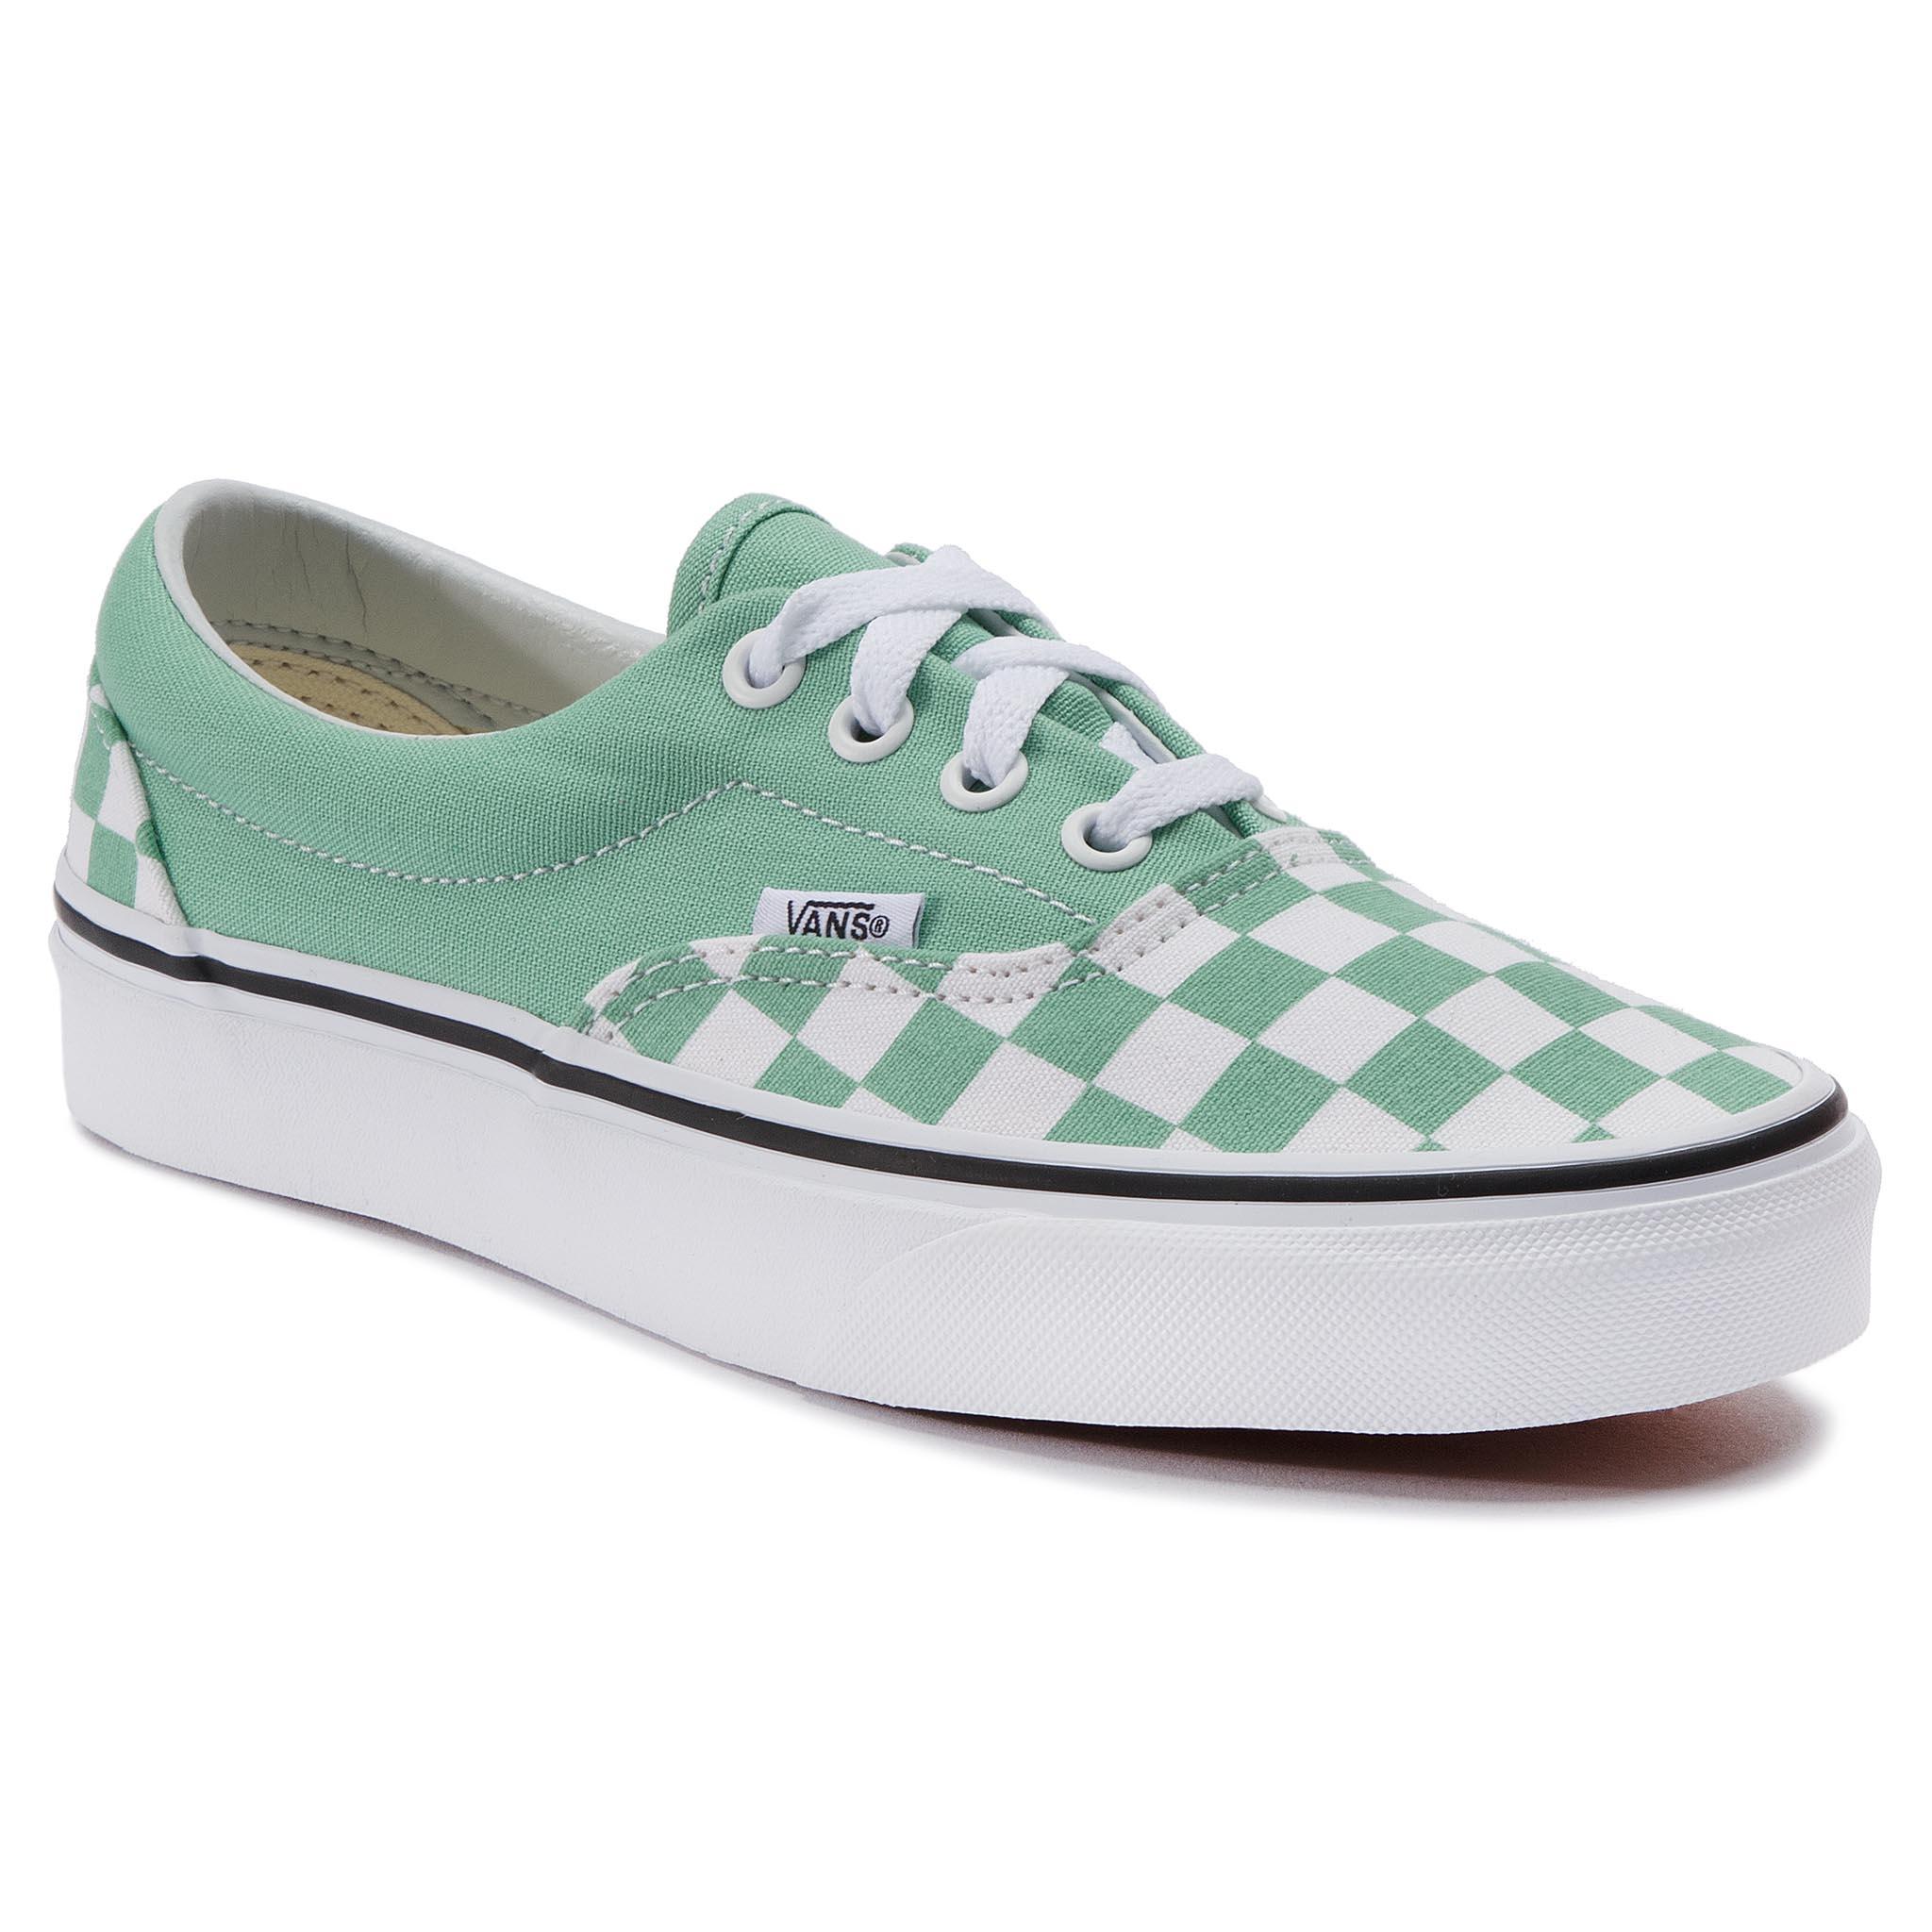 34b39b579a4 Πάνινα παπούτσια VANS - Era VN0A38FRVOV1 (Checkerboard) Neptune Gr ...